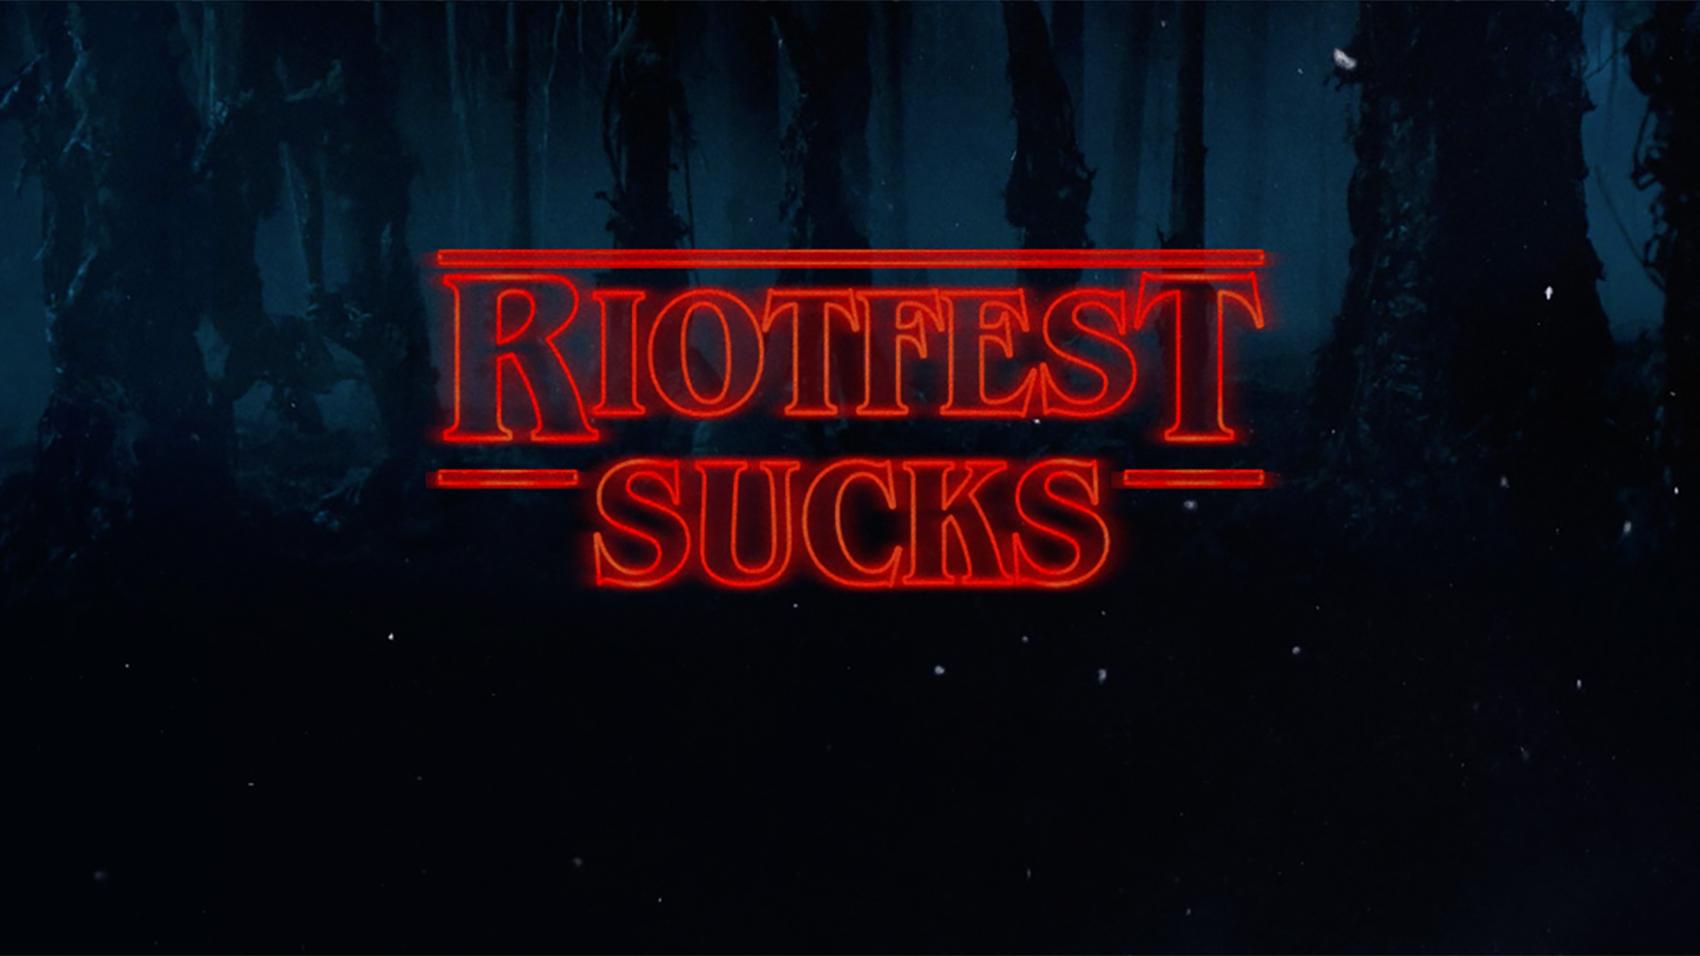 riotfest-sucks stranger thigns